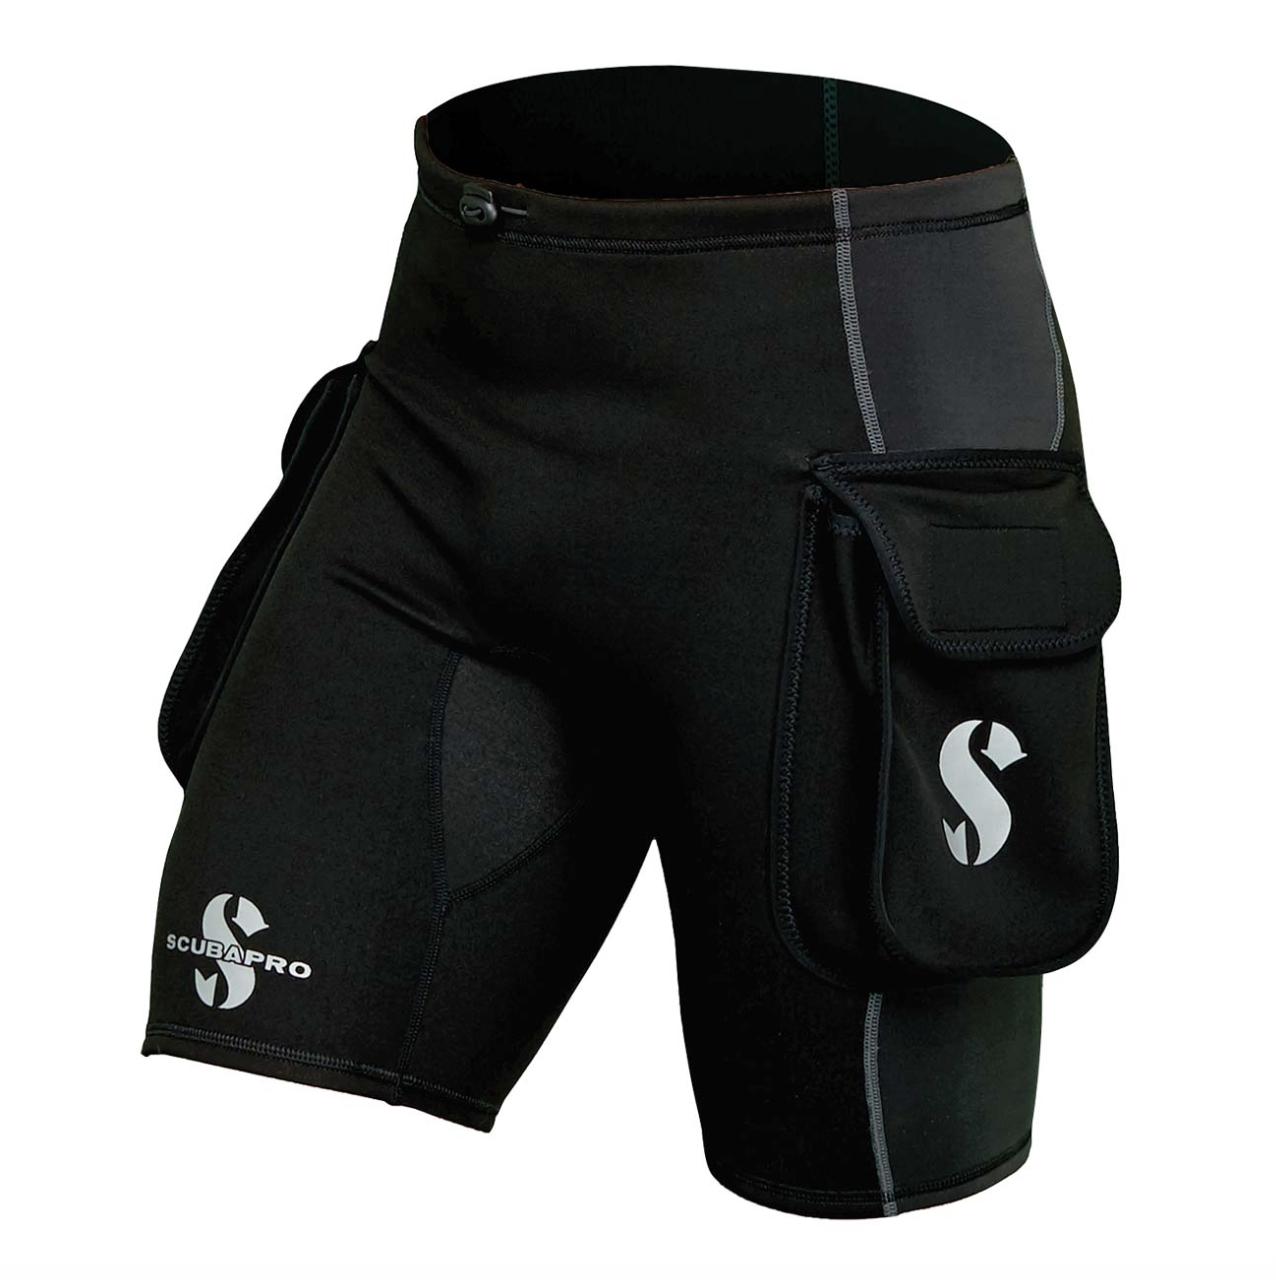 Scuba Pro Hybrid Cargo Shorts (1MM Men's)